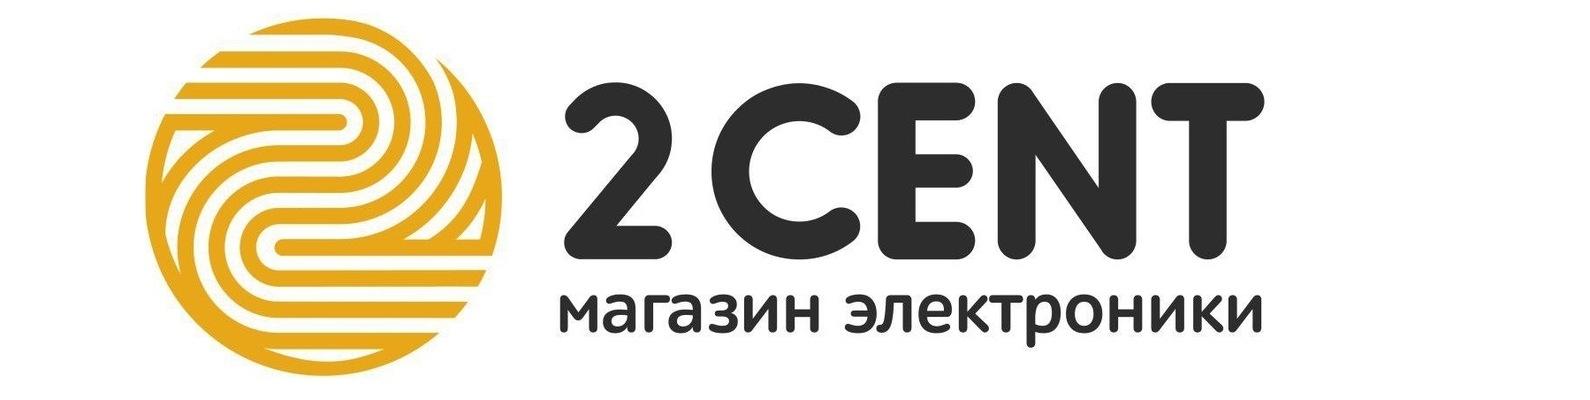 2cent Ru Интернет Магазин Отзывы